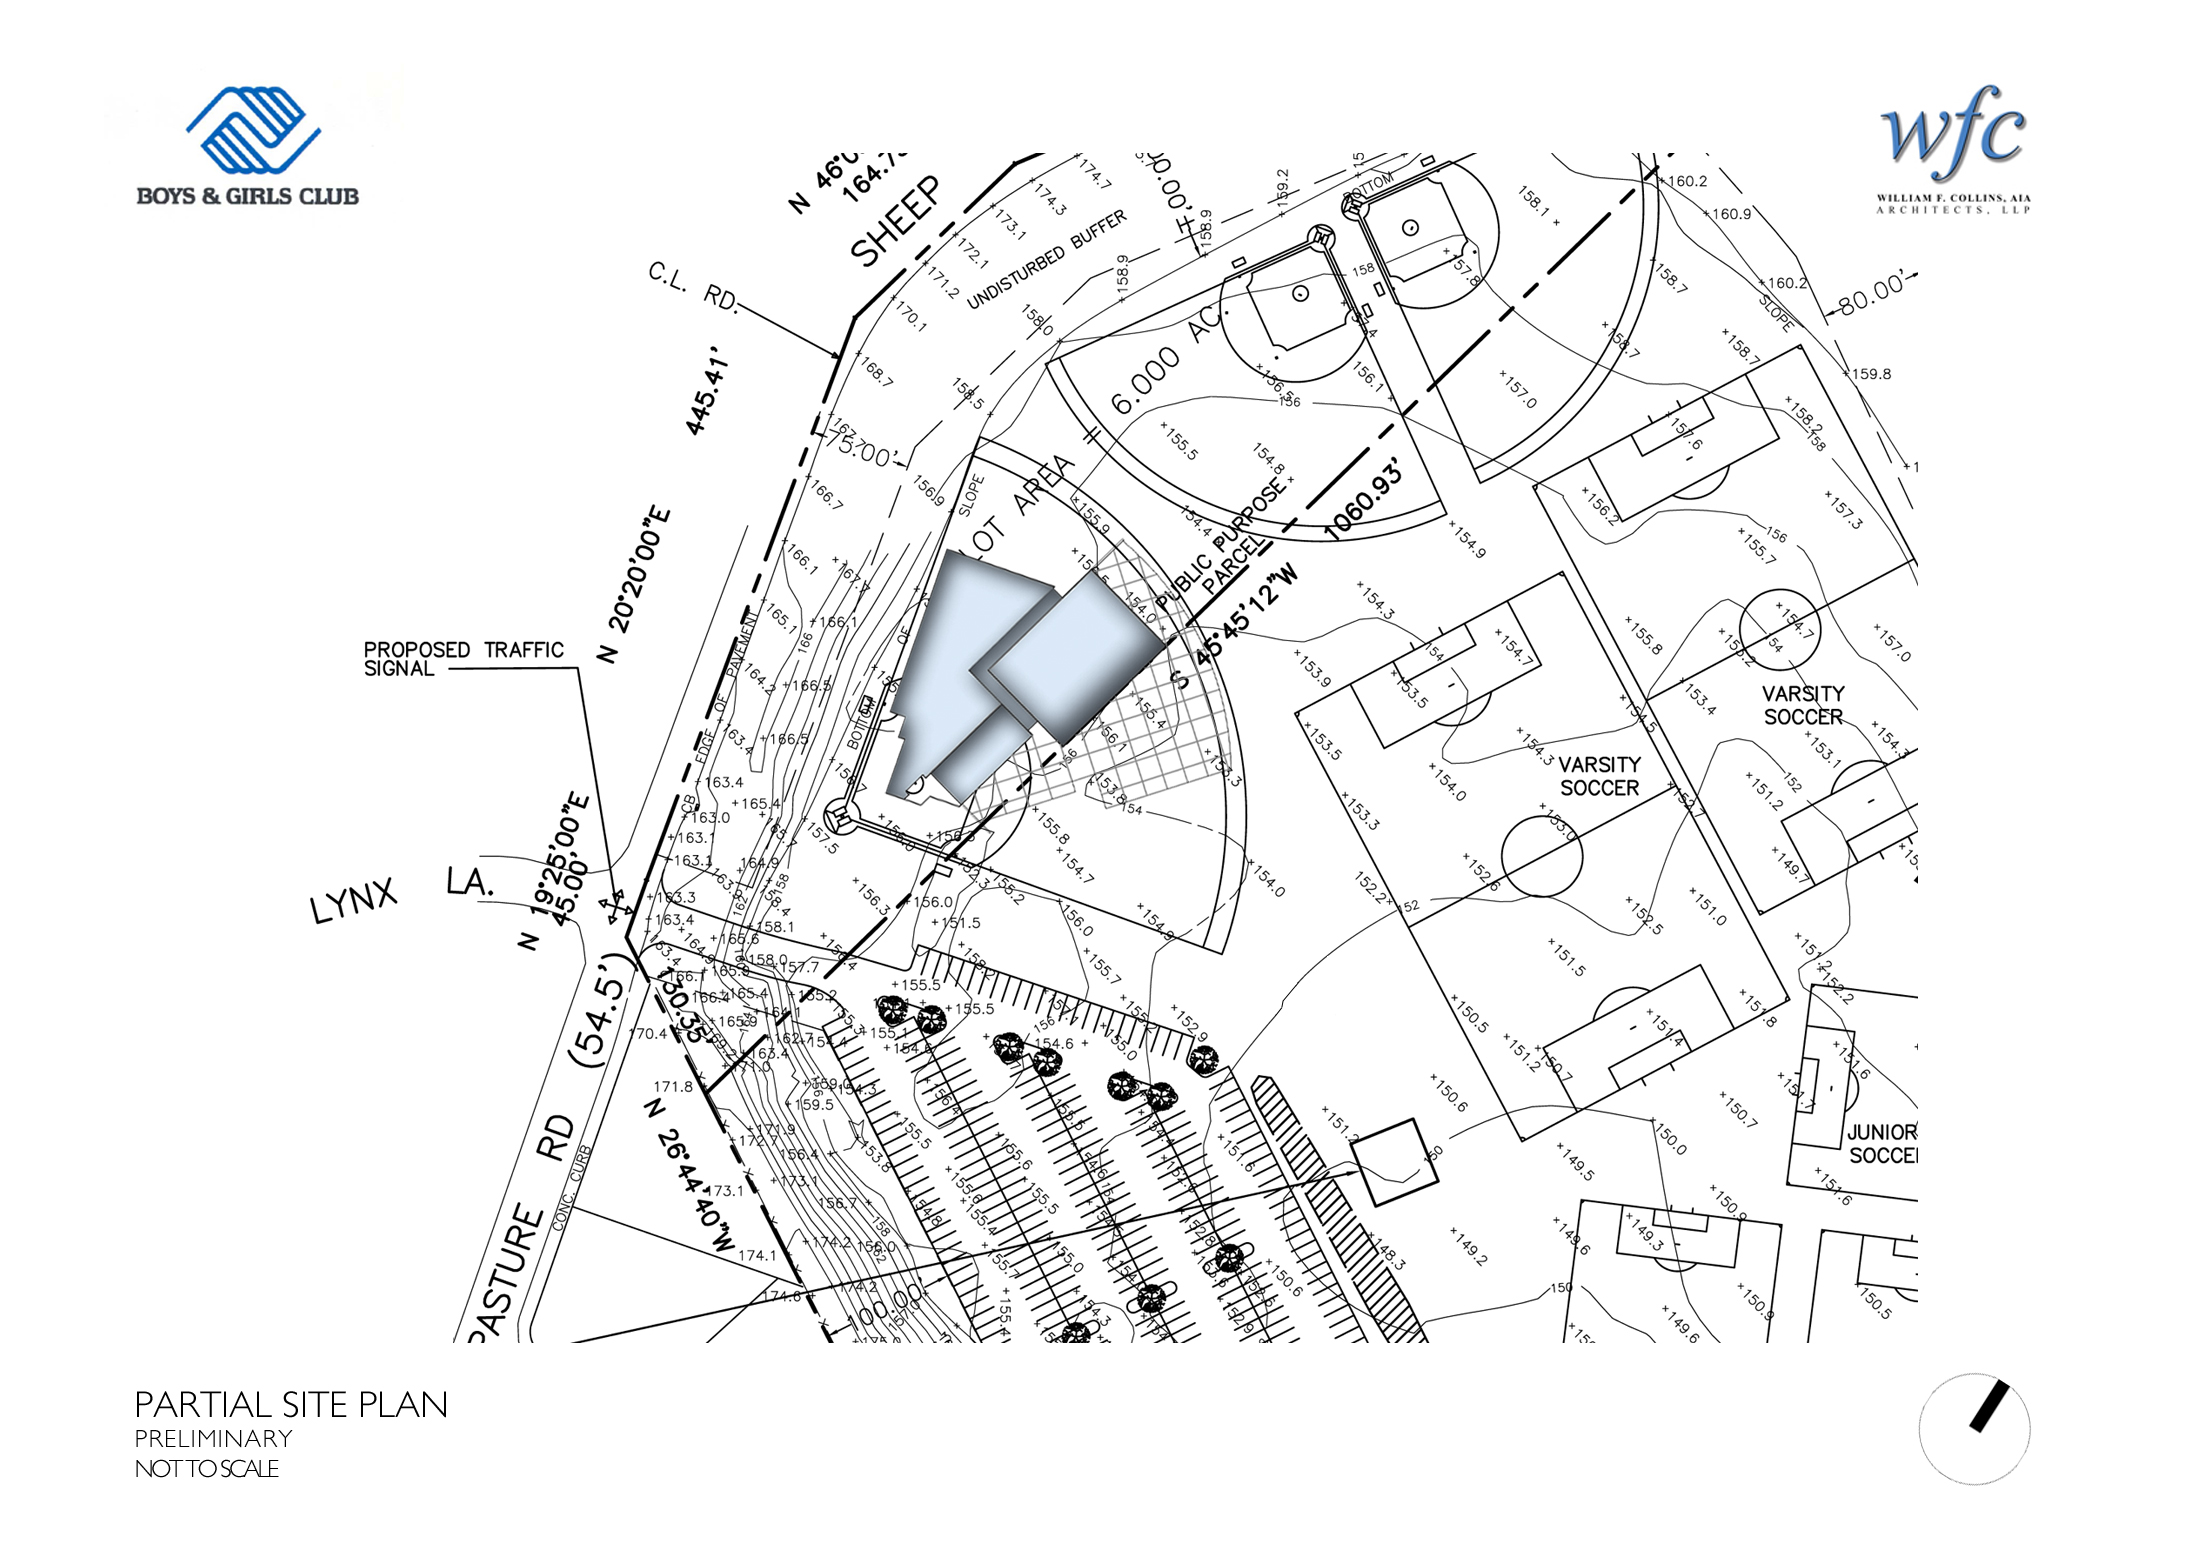 2200x1567 Boys Amp Girls Club Design Wfc Architects